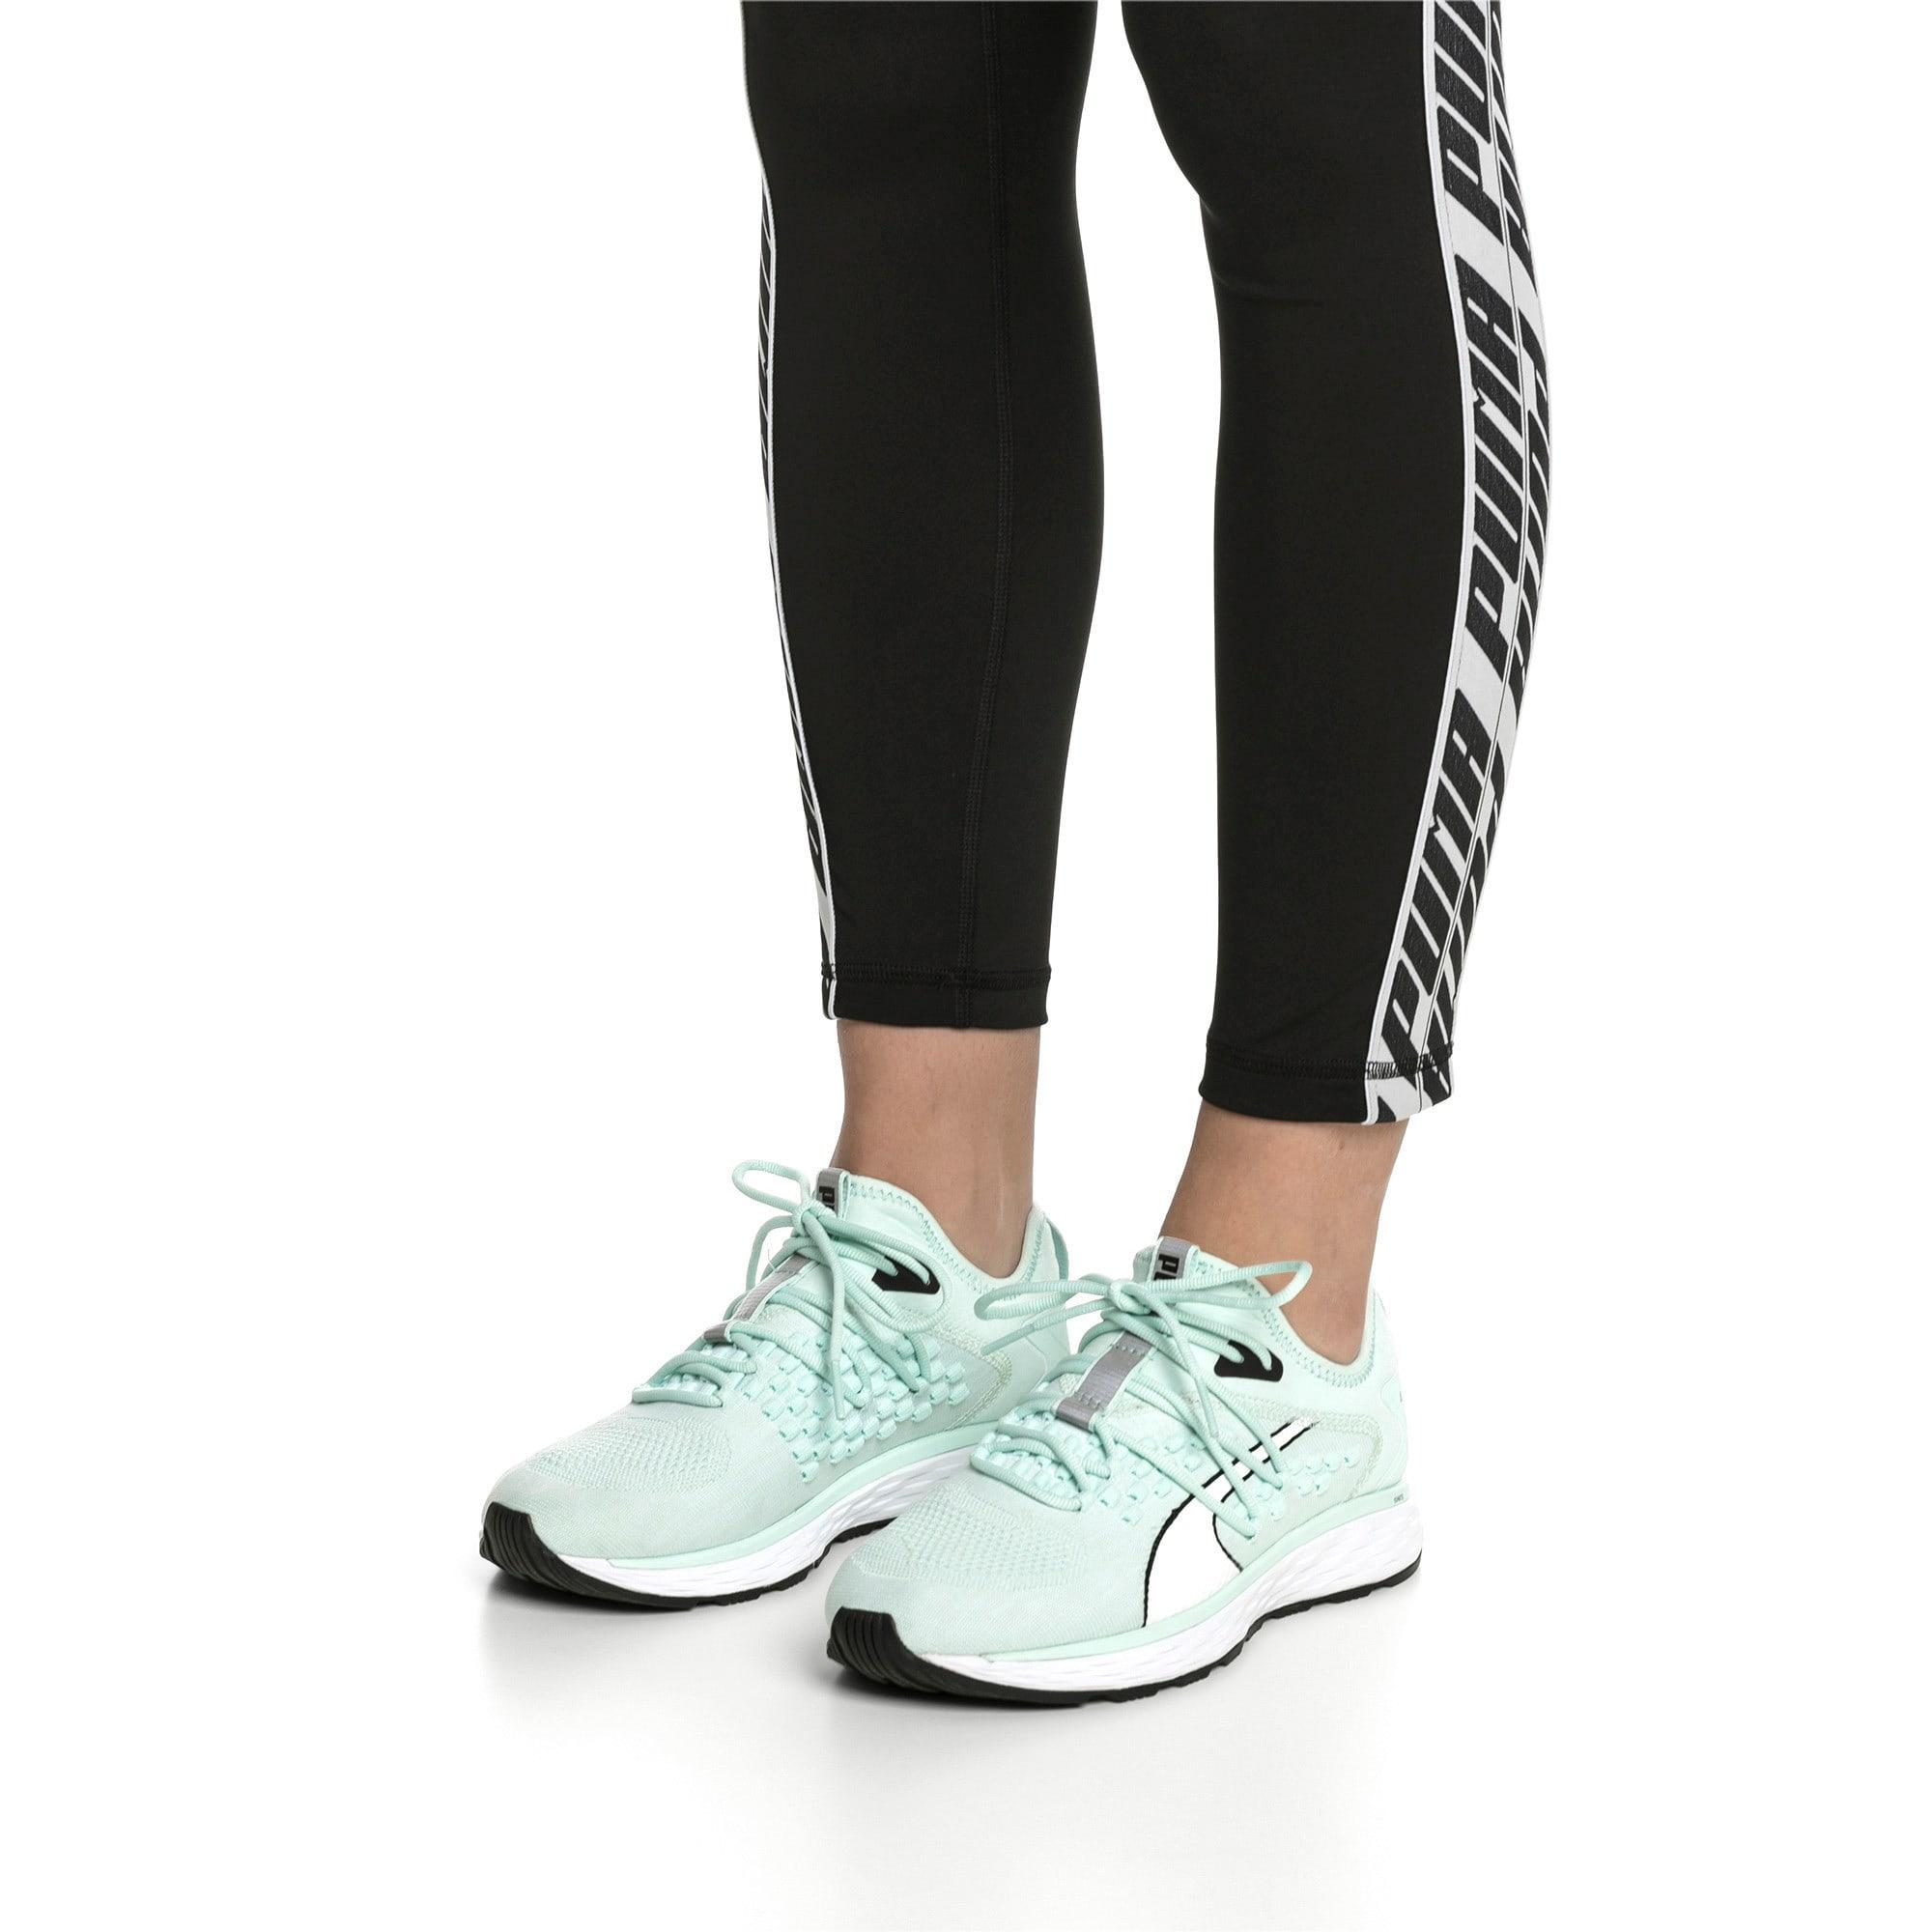 Thumbnail 2 of SPEED FUSEFIT Women's Running Shoes, Fair Aqua-Puma White, medium-IND